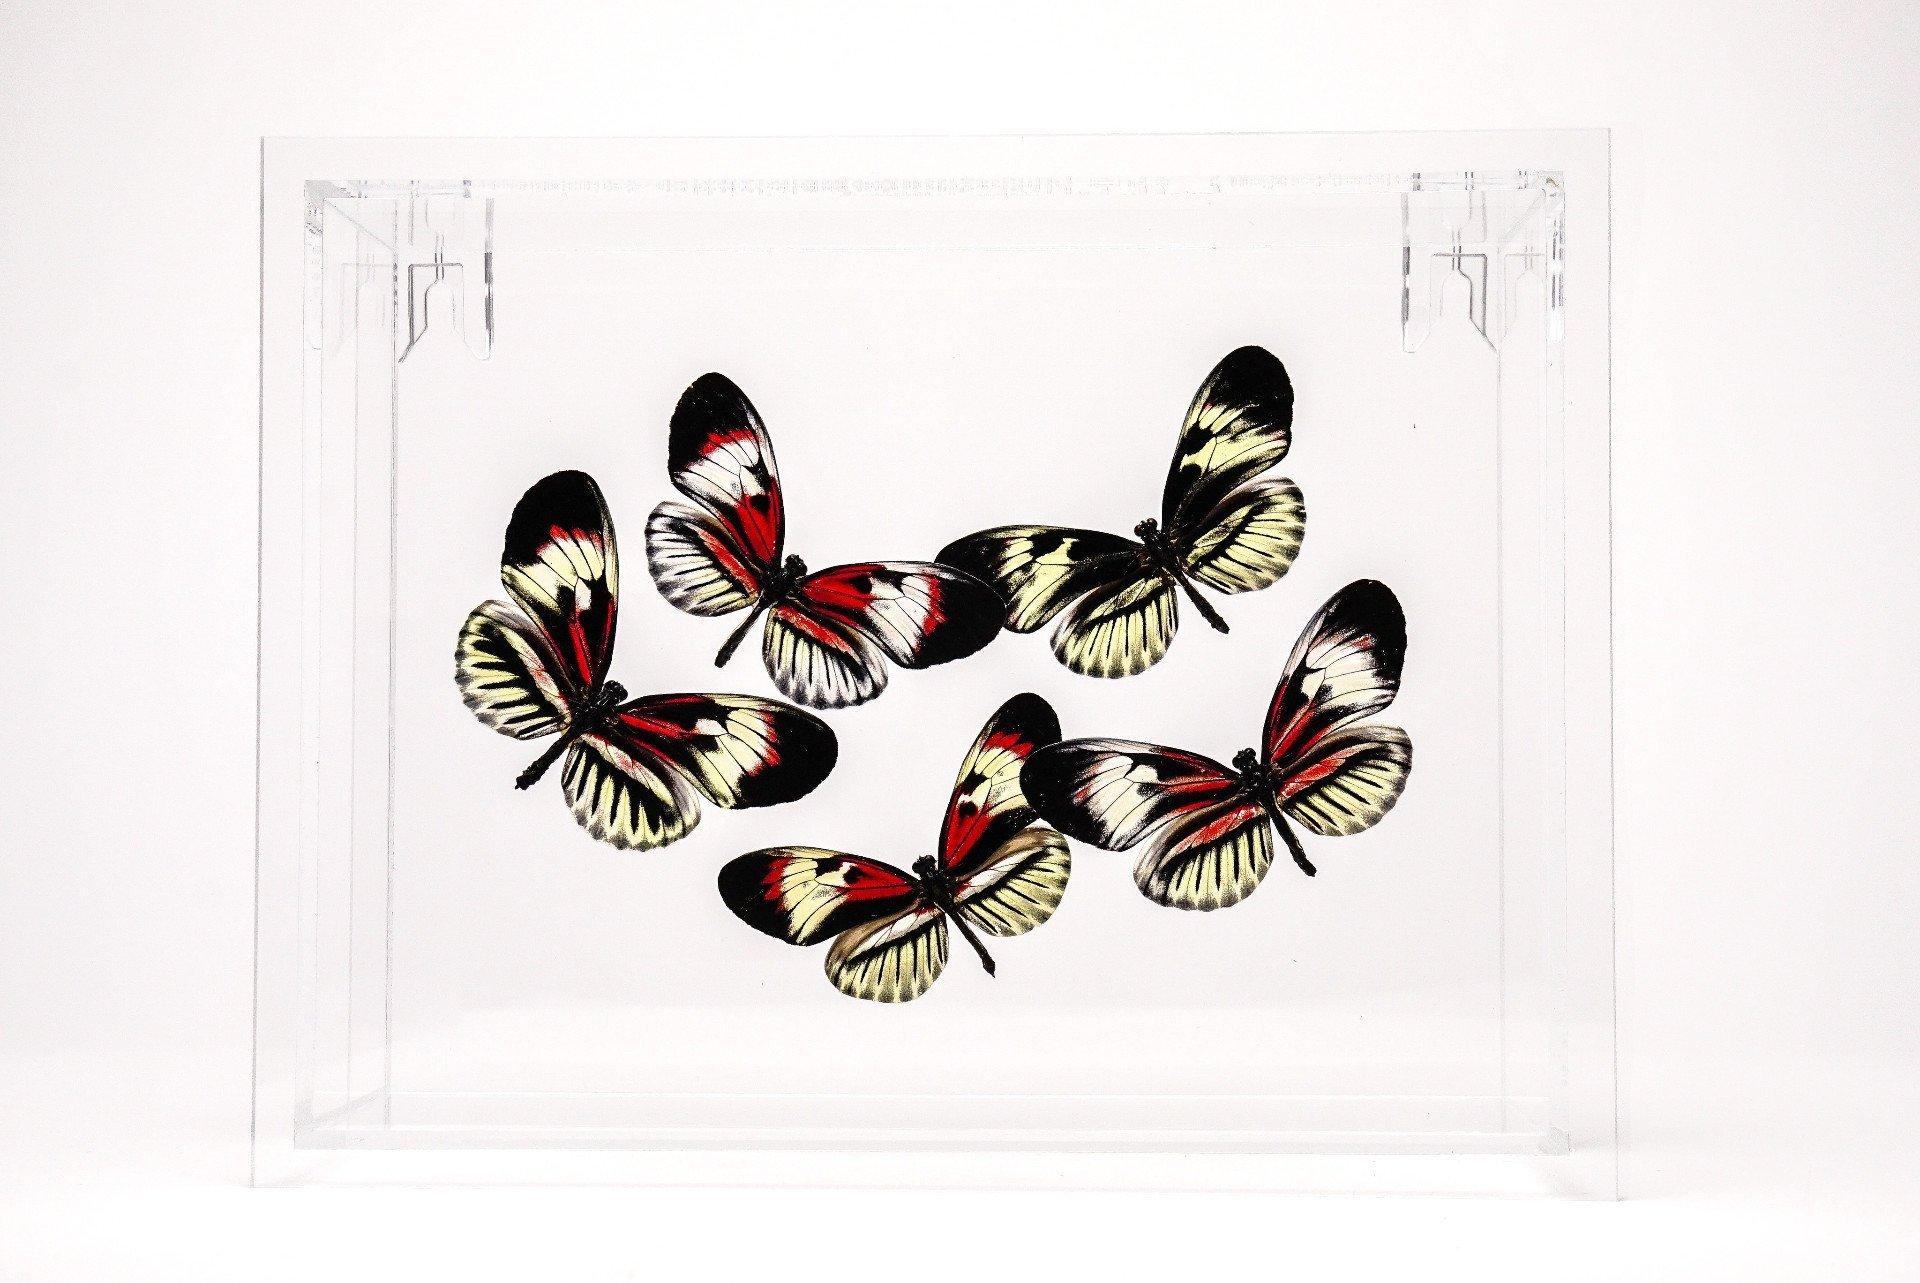 Astro Gallery Of Gems Piano Key Butterflies in 6x8 Frame by Astro Gallery Of Gems